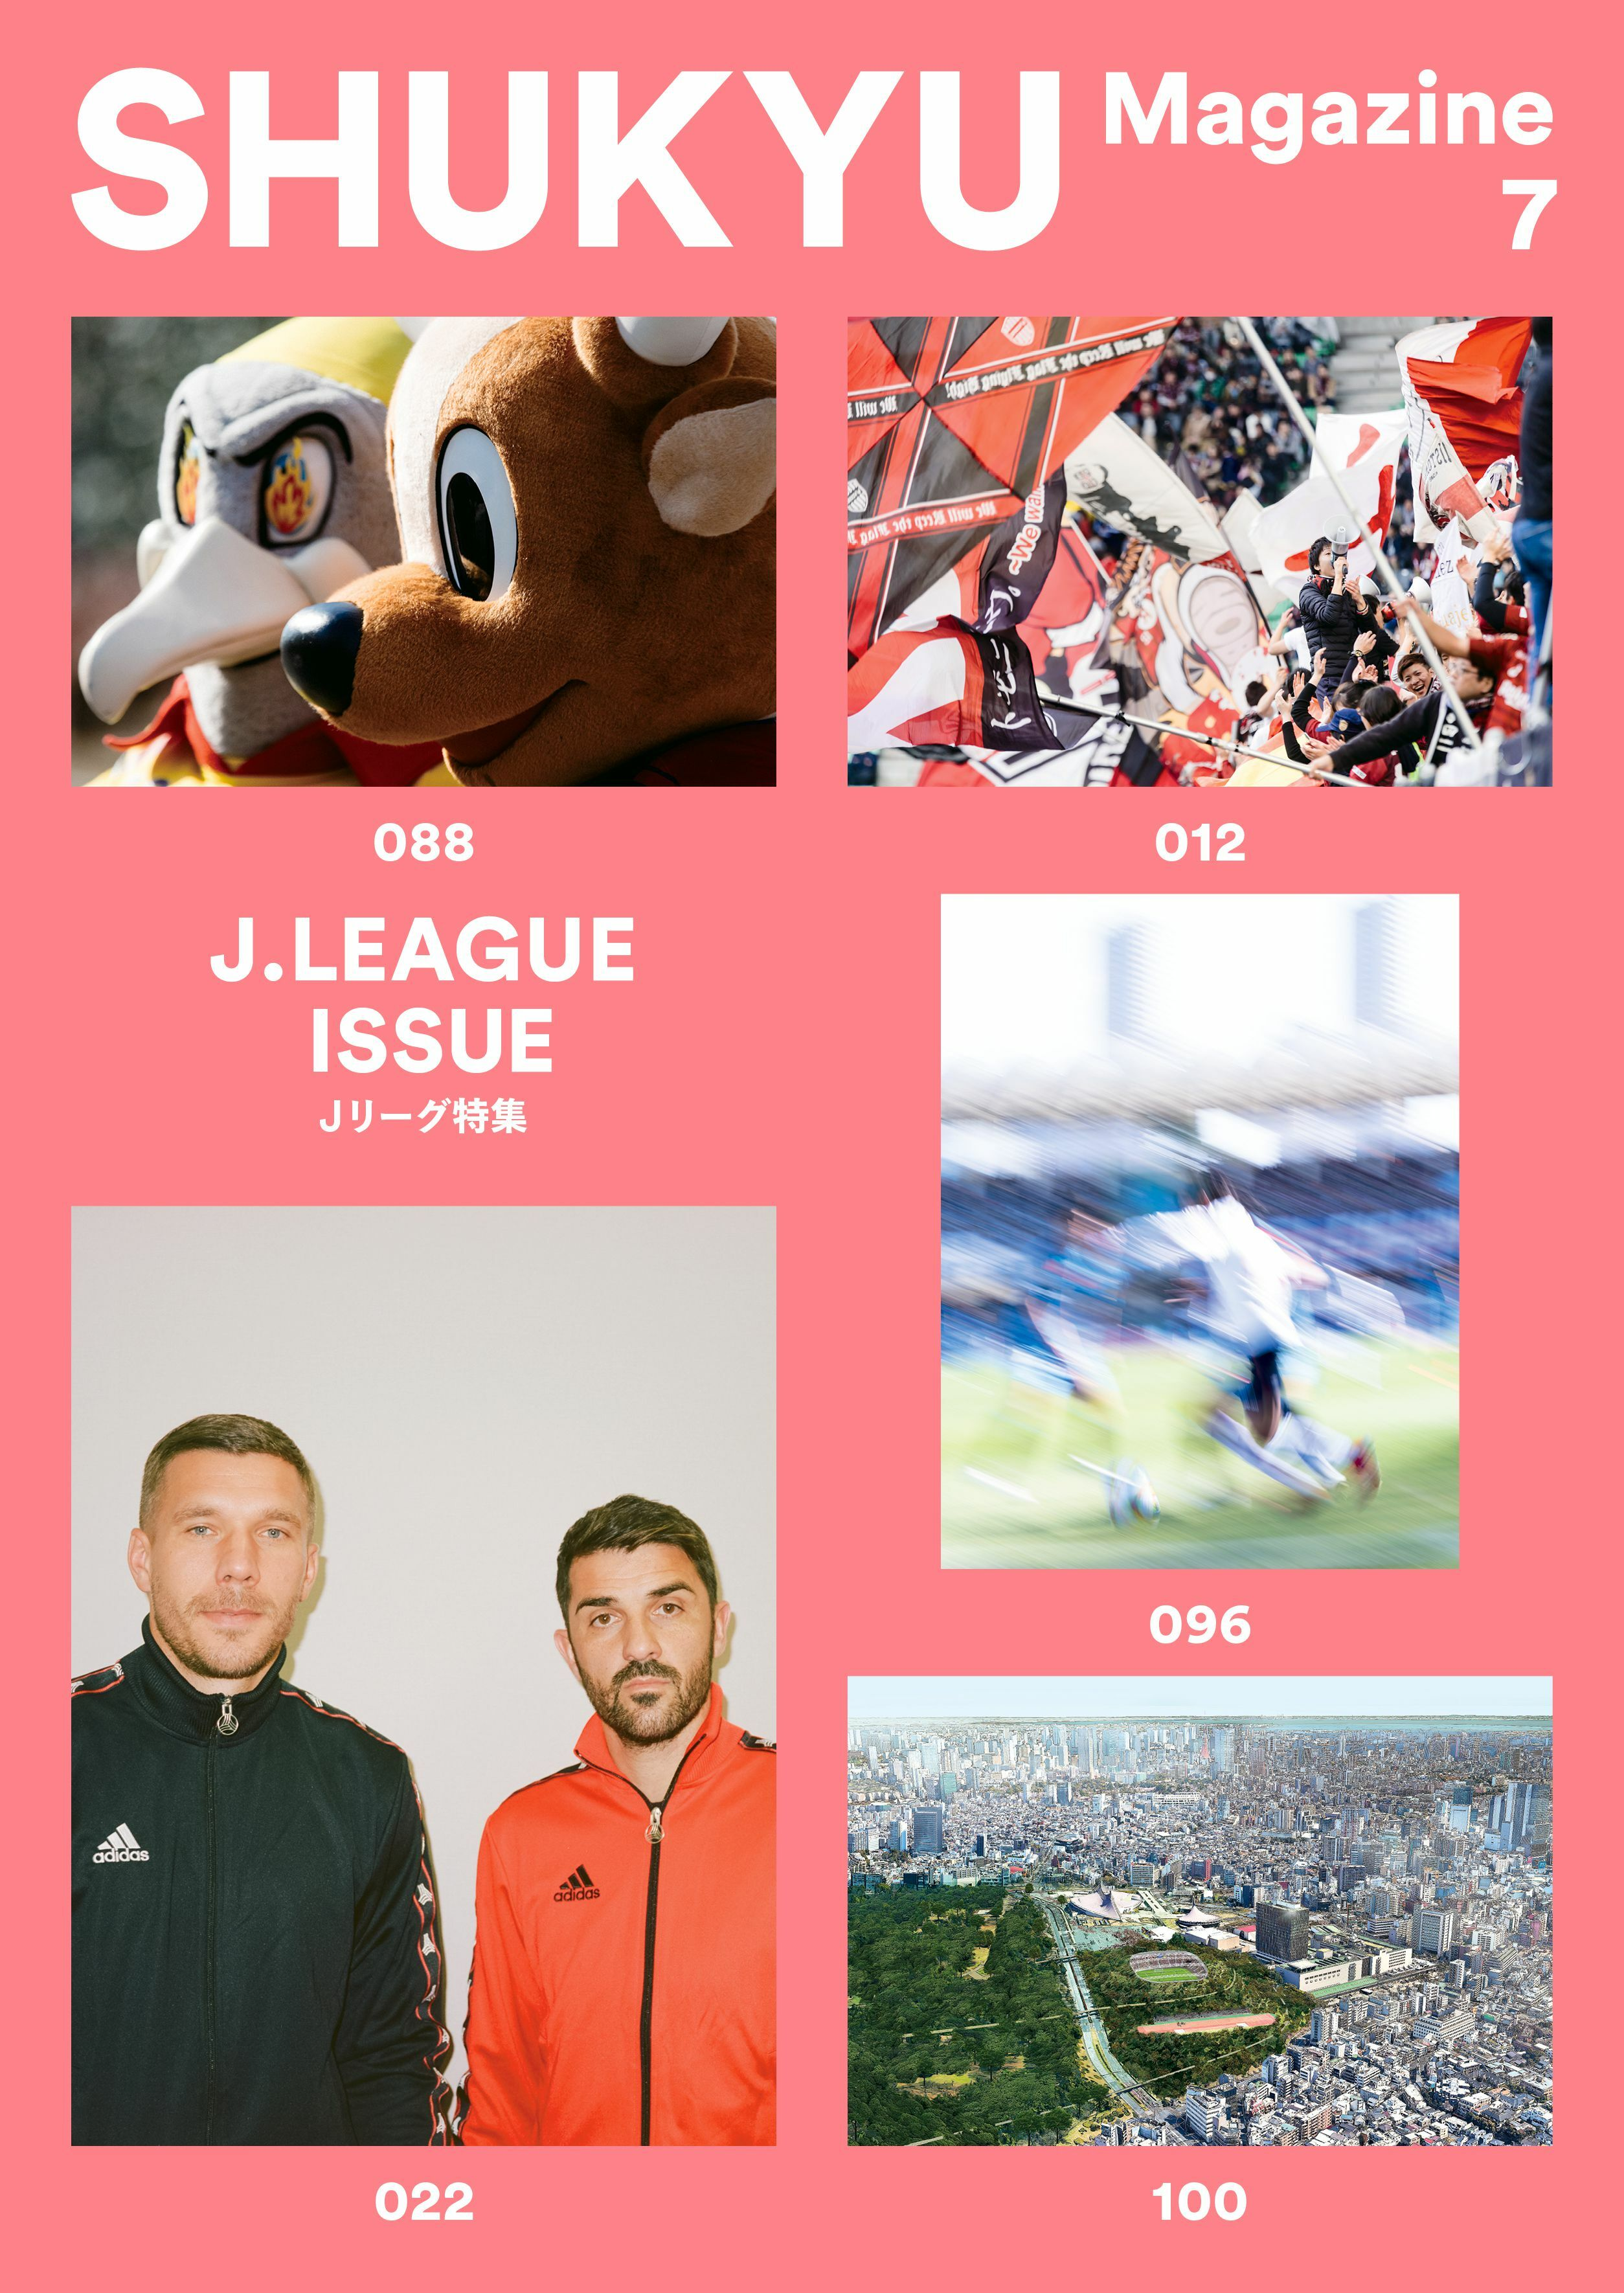 SHUKYU Magazine ROOTS ISSUE Vol.7 | SHUKYU MAGAZINE